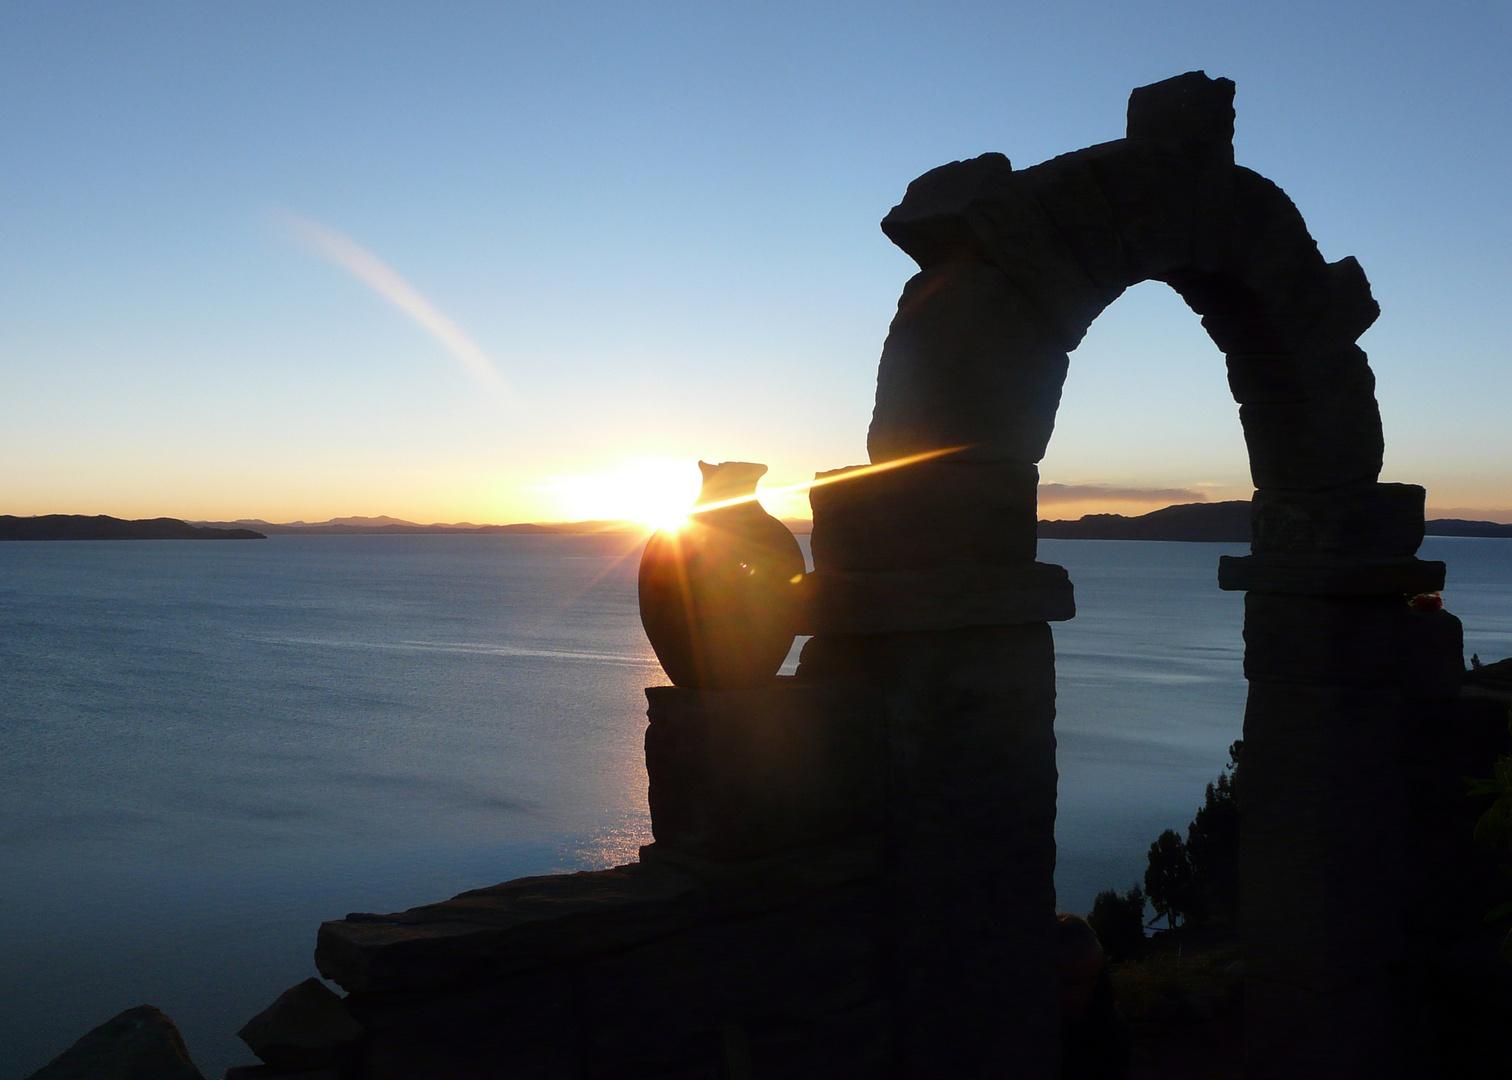 Sonnenuntergang bei Senor Alipio